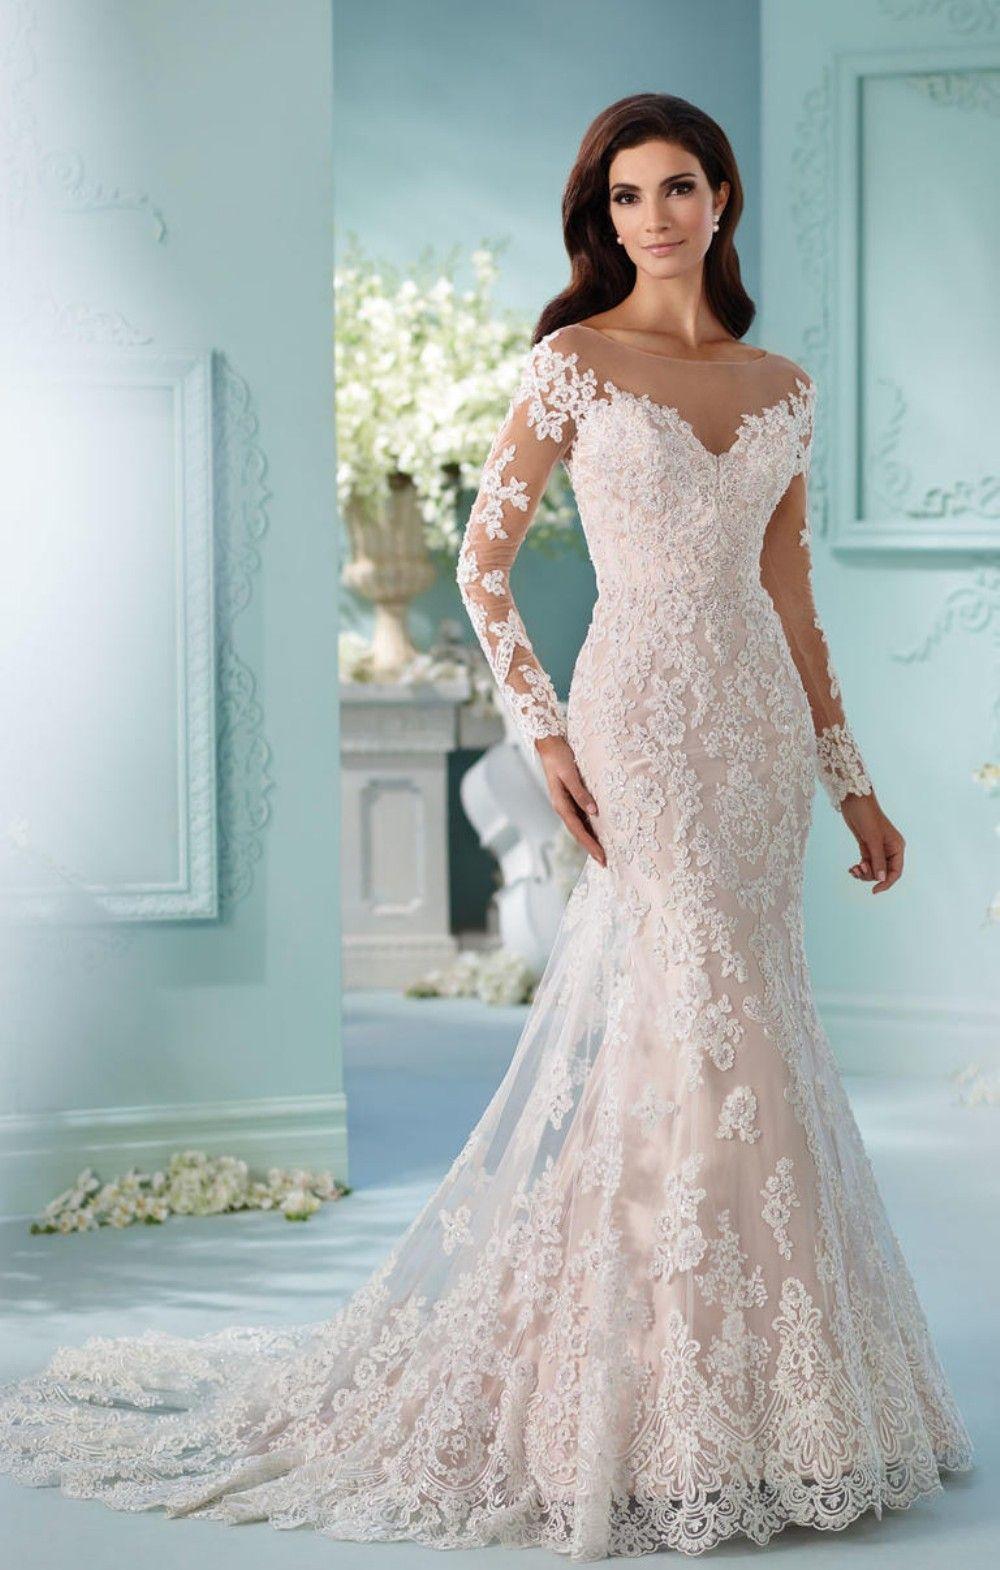 37 Elegant Lace Mermaid Wedding Dress From World Class Designer ...